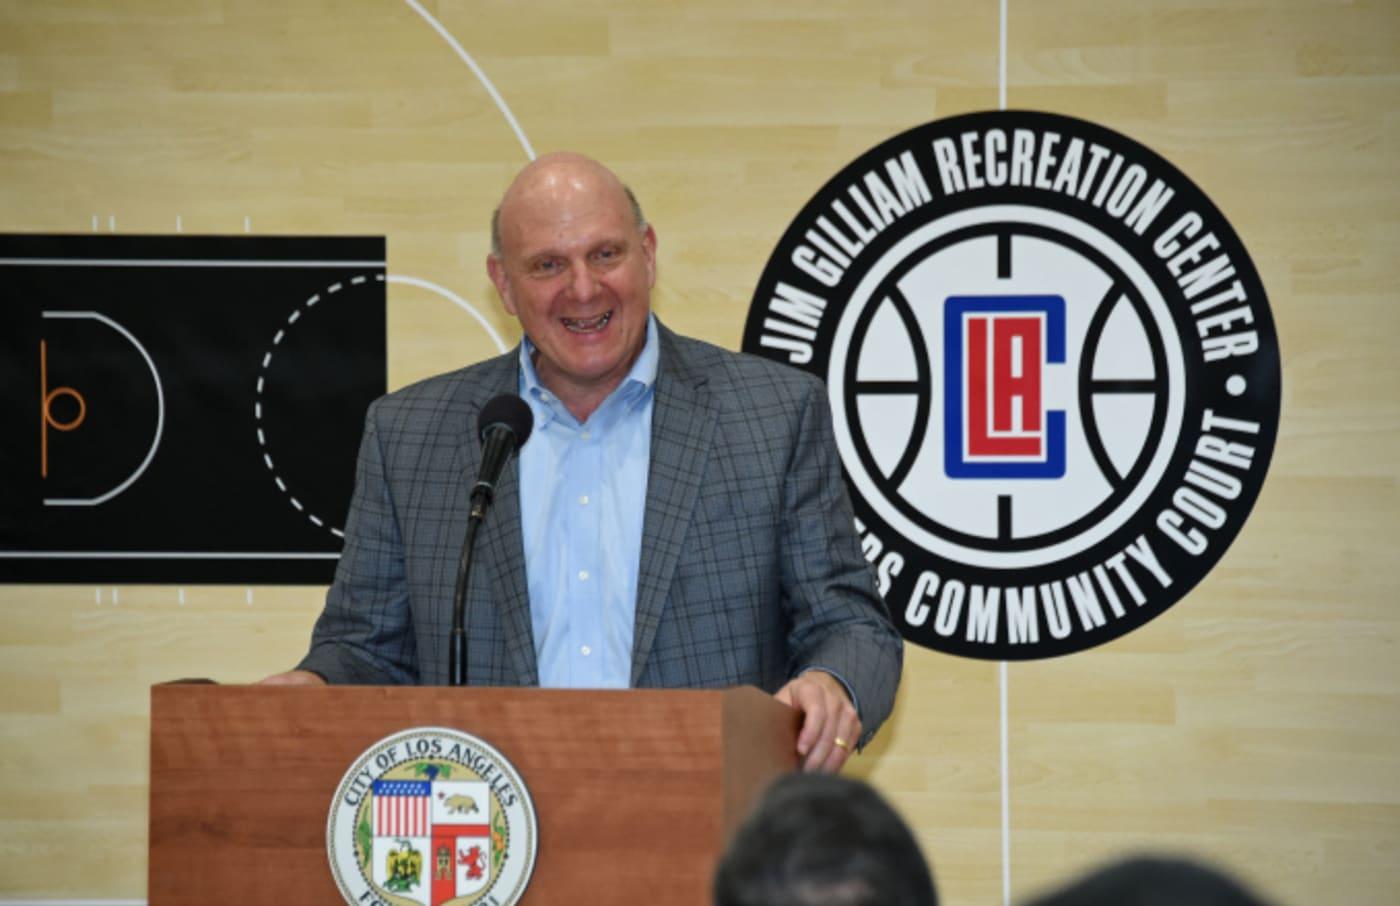 Owner of the LA Clippers, Steve Ballmer